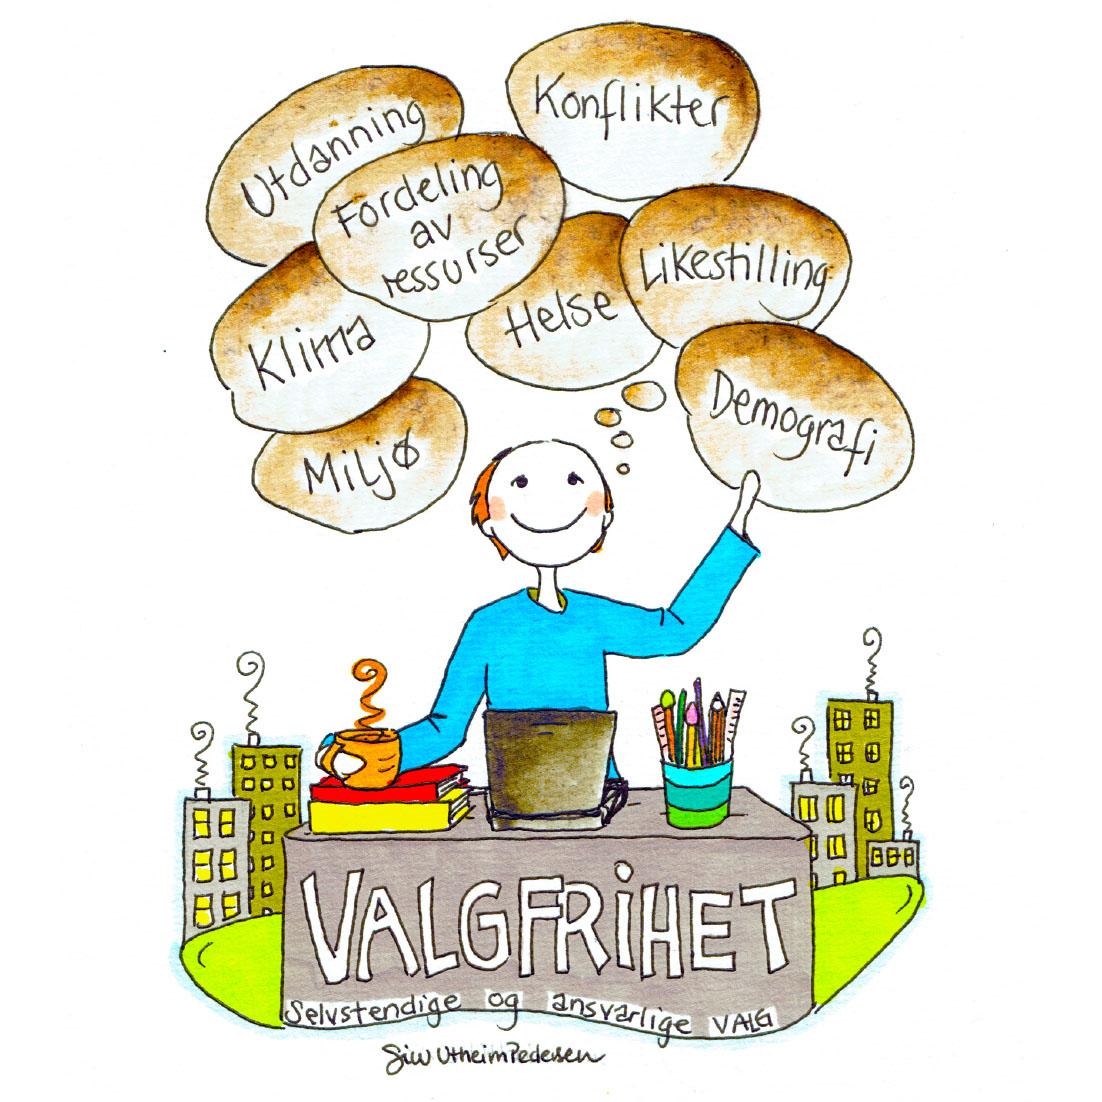 VALGFRIHET